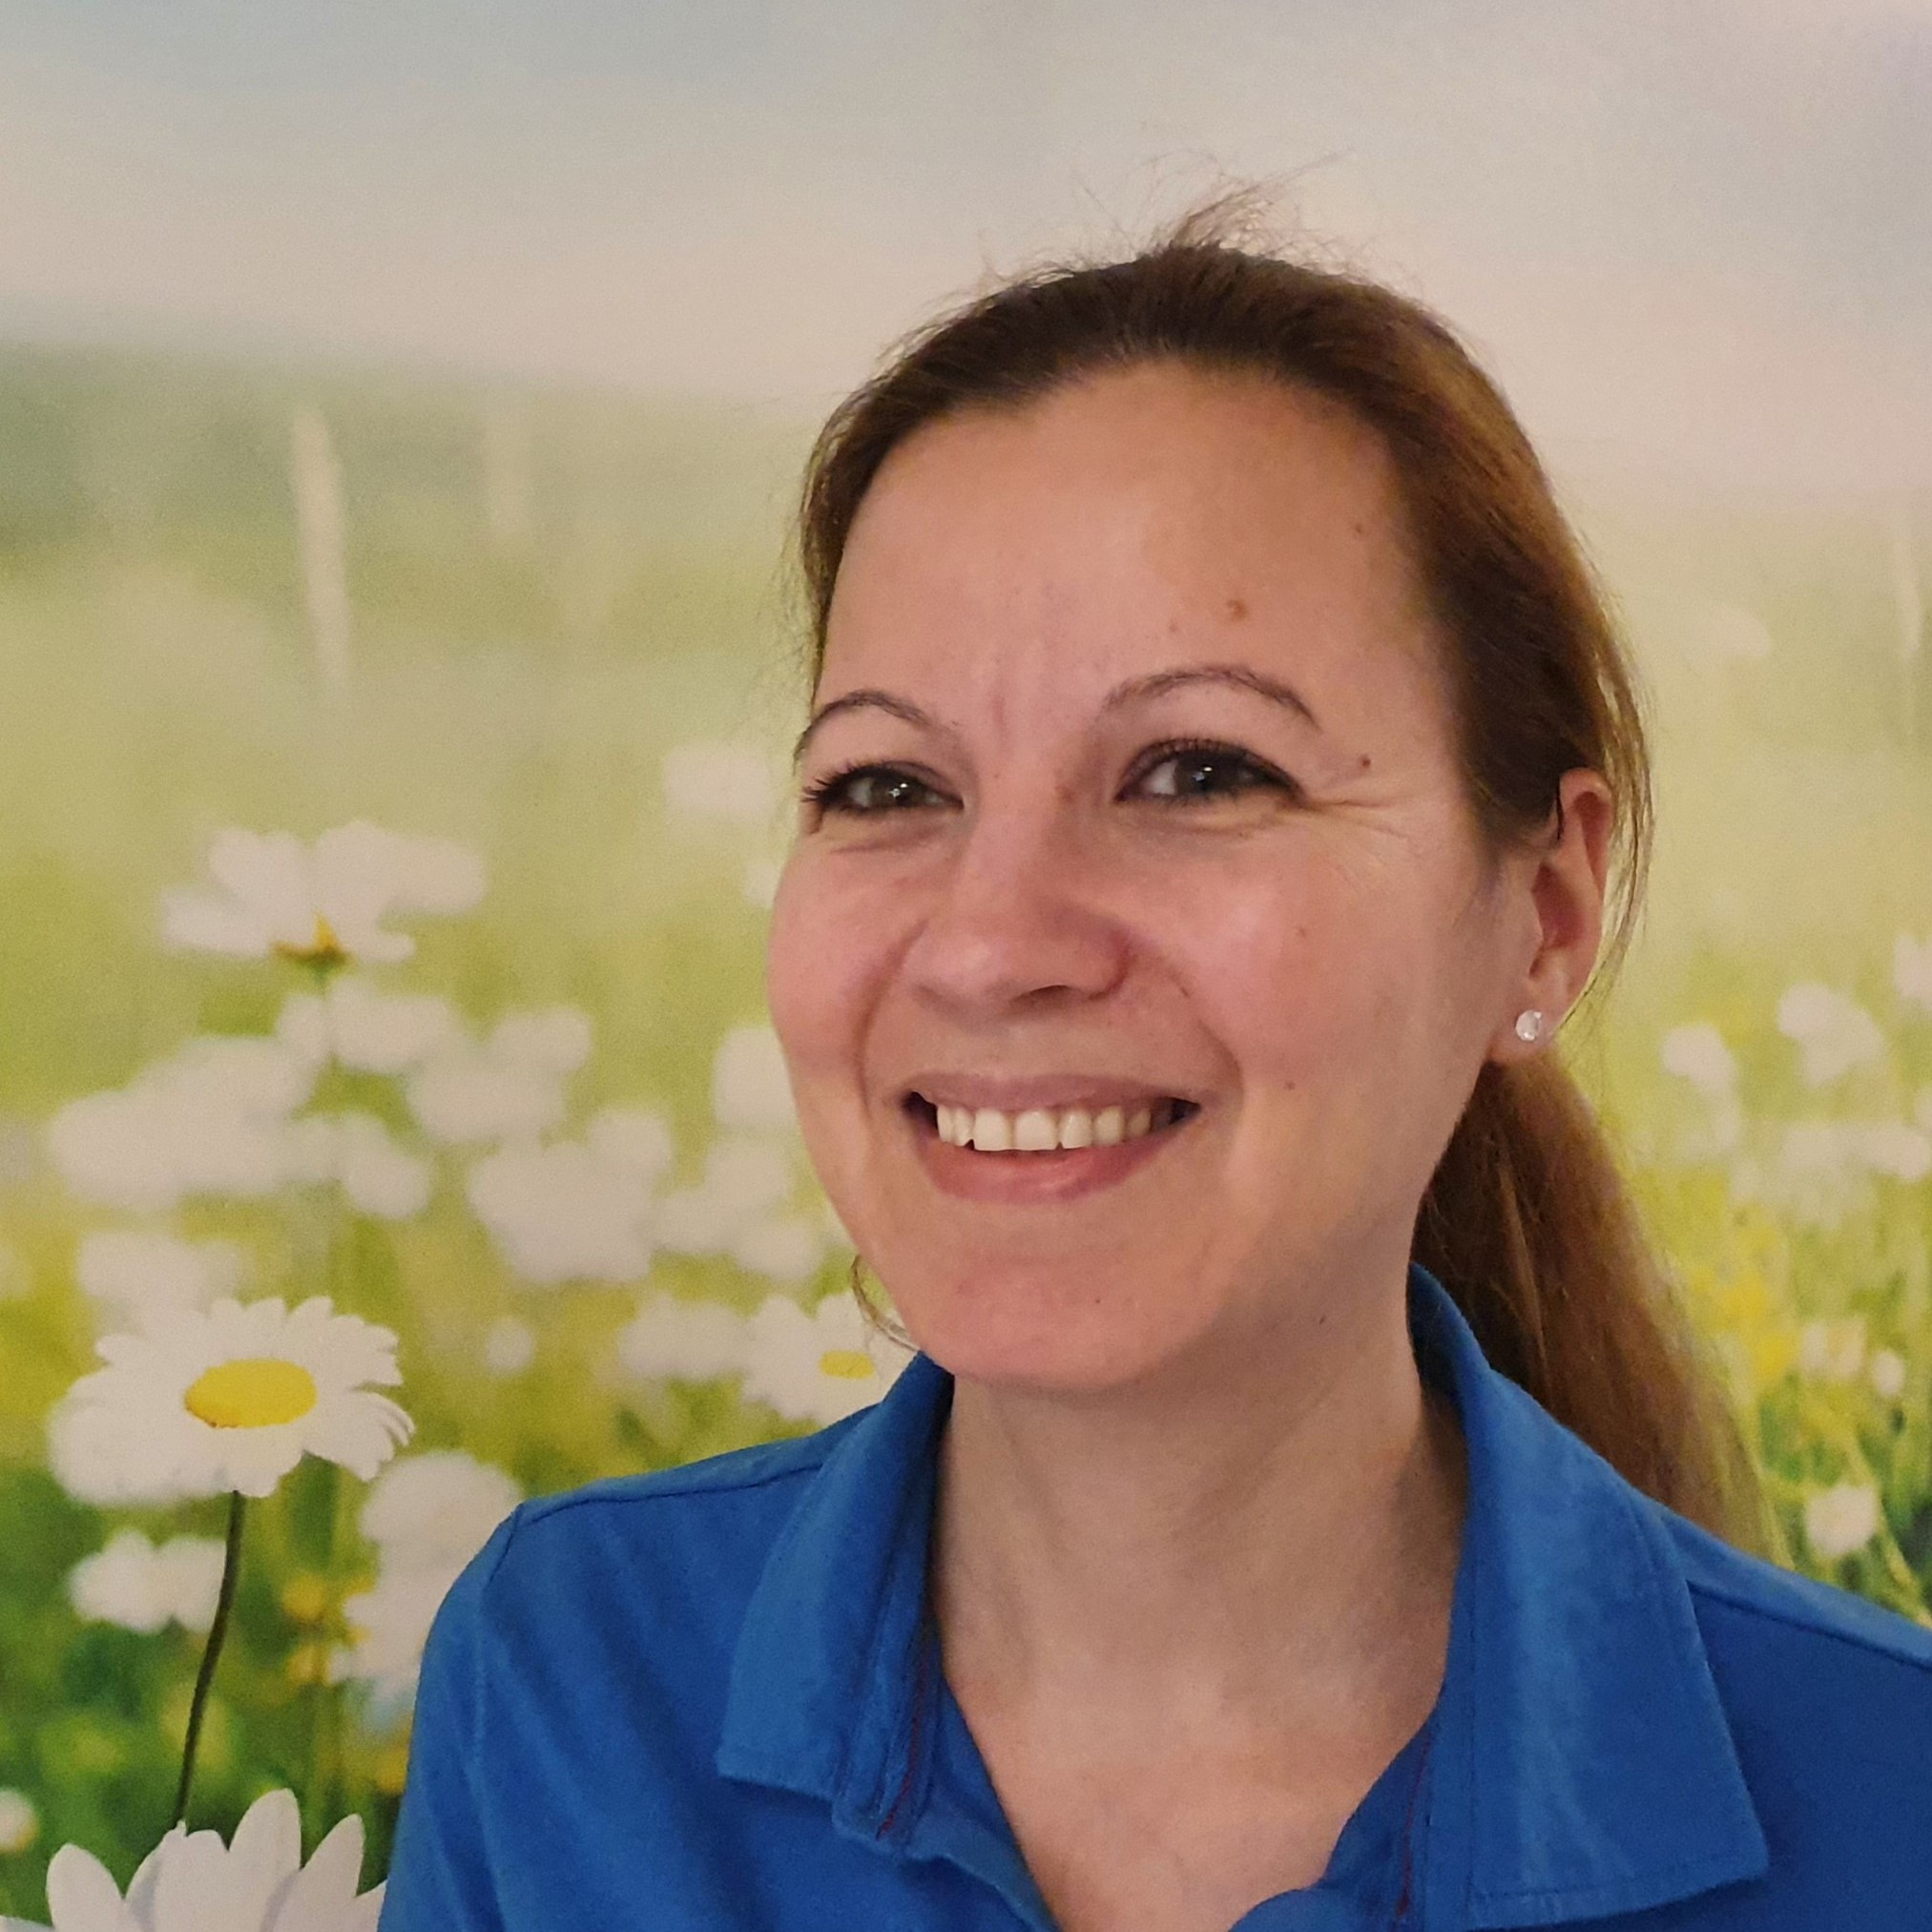 Frau Lipp 2 Zahnarztpraxis Dr. Grüttner Schroff